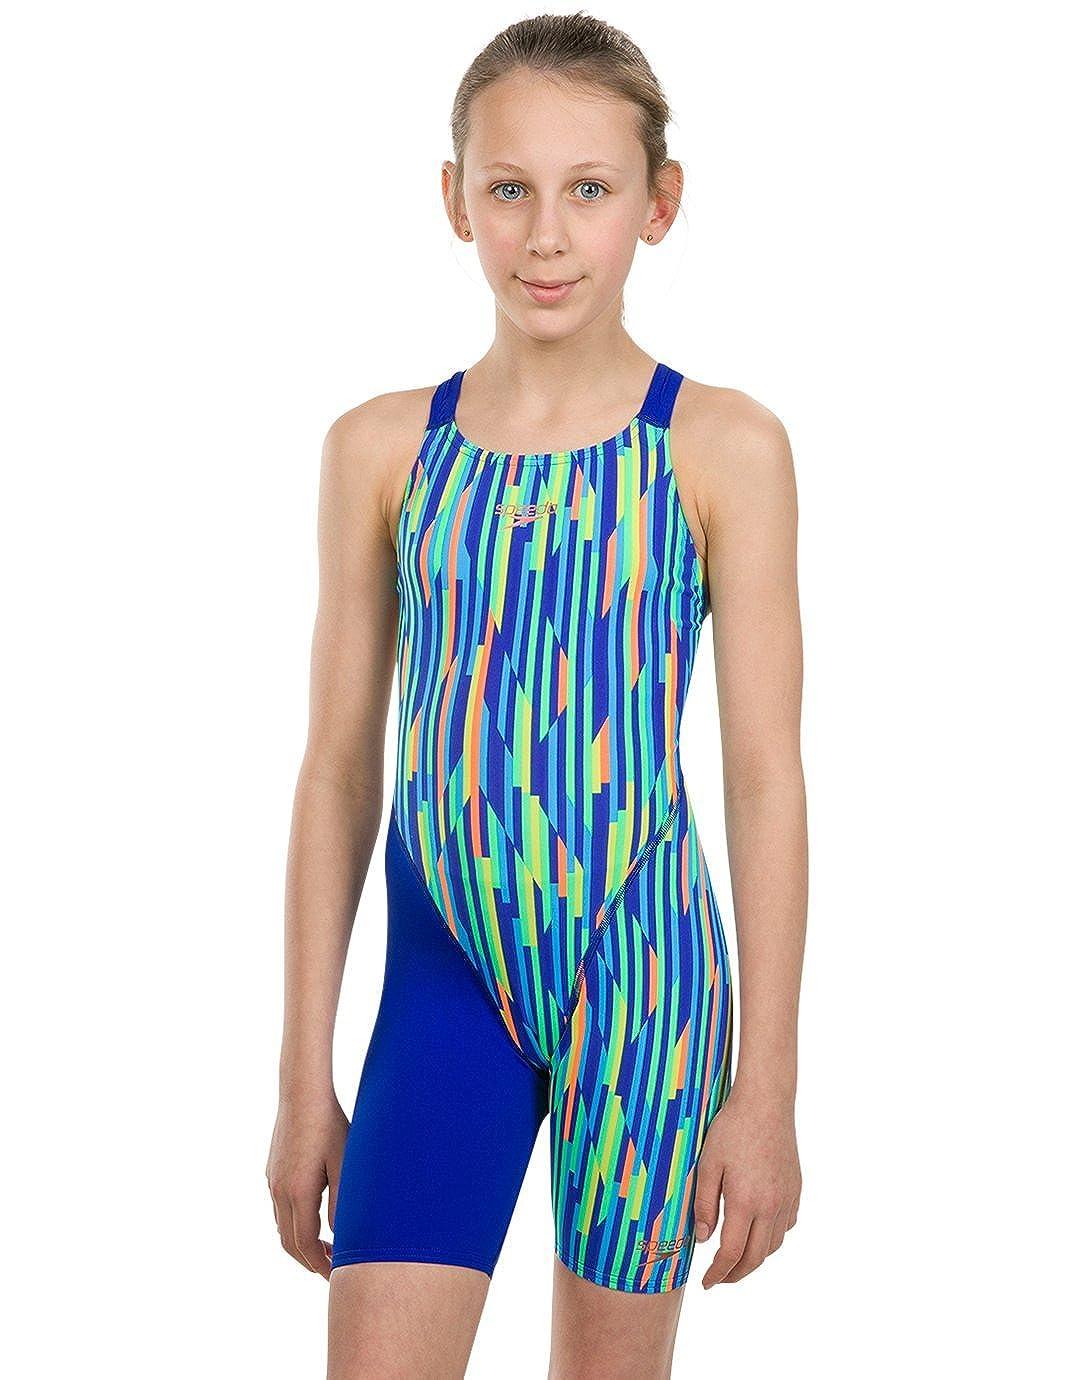 Speedo Girls Fastskin Endurance Openback Kneeskin Swimsuit